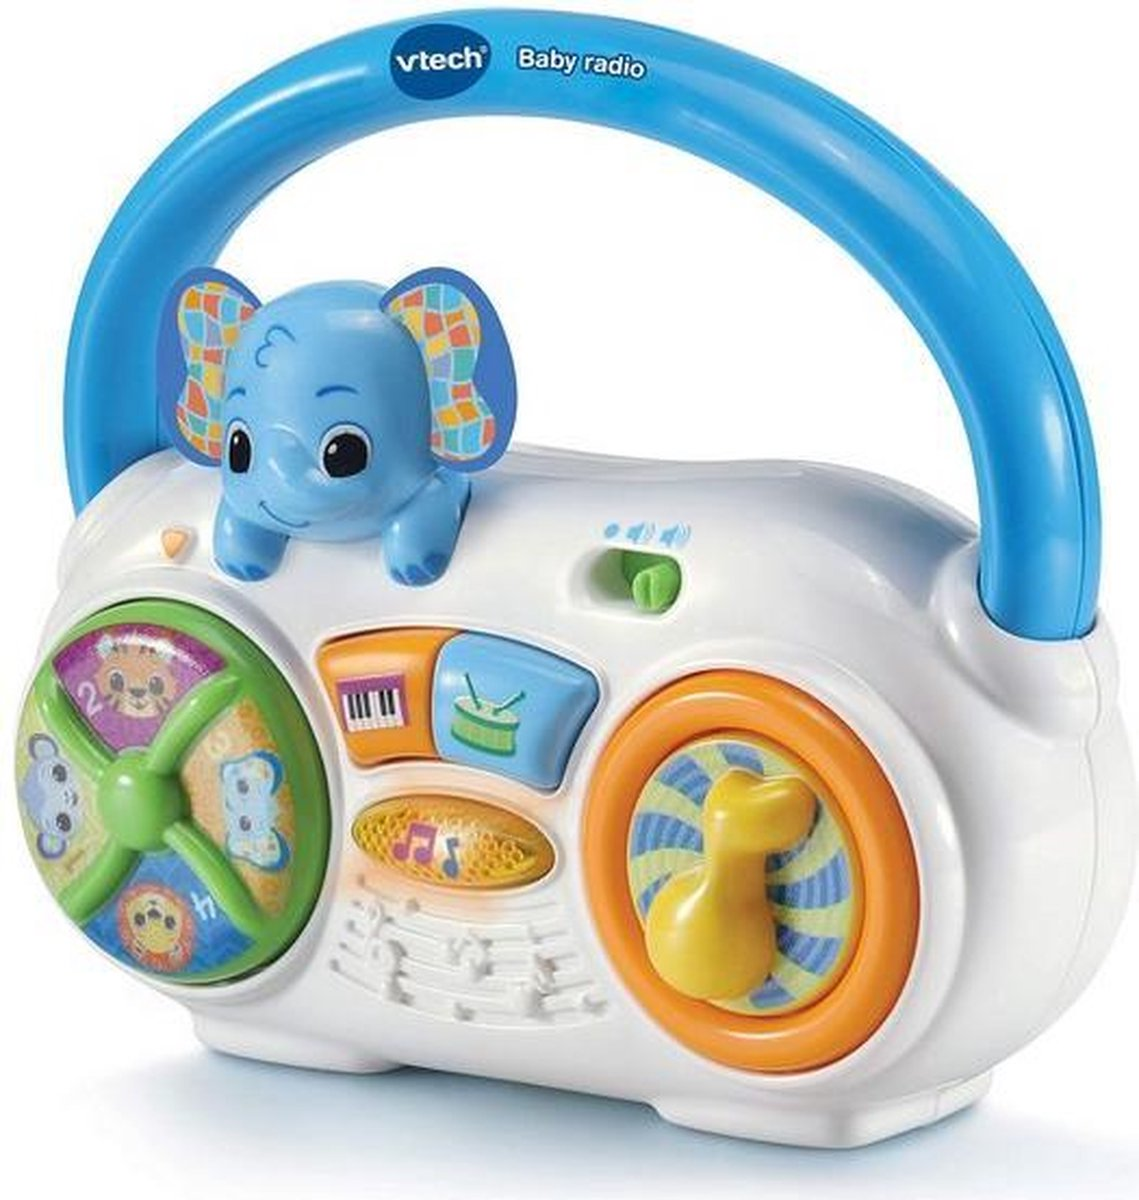 Radio Vtech Baby Radio (ES)